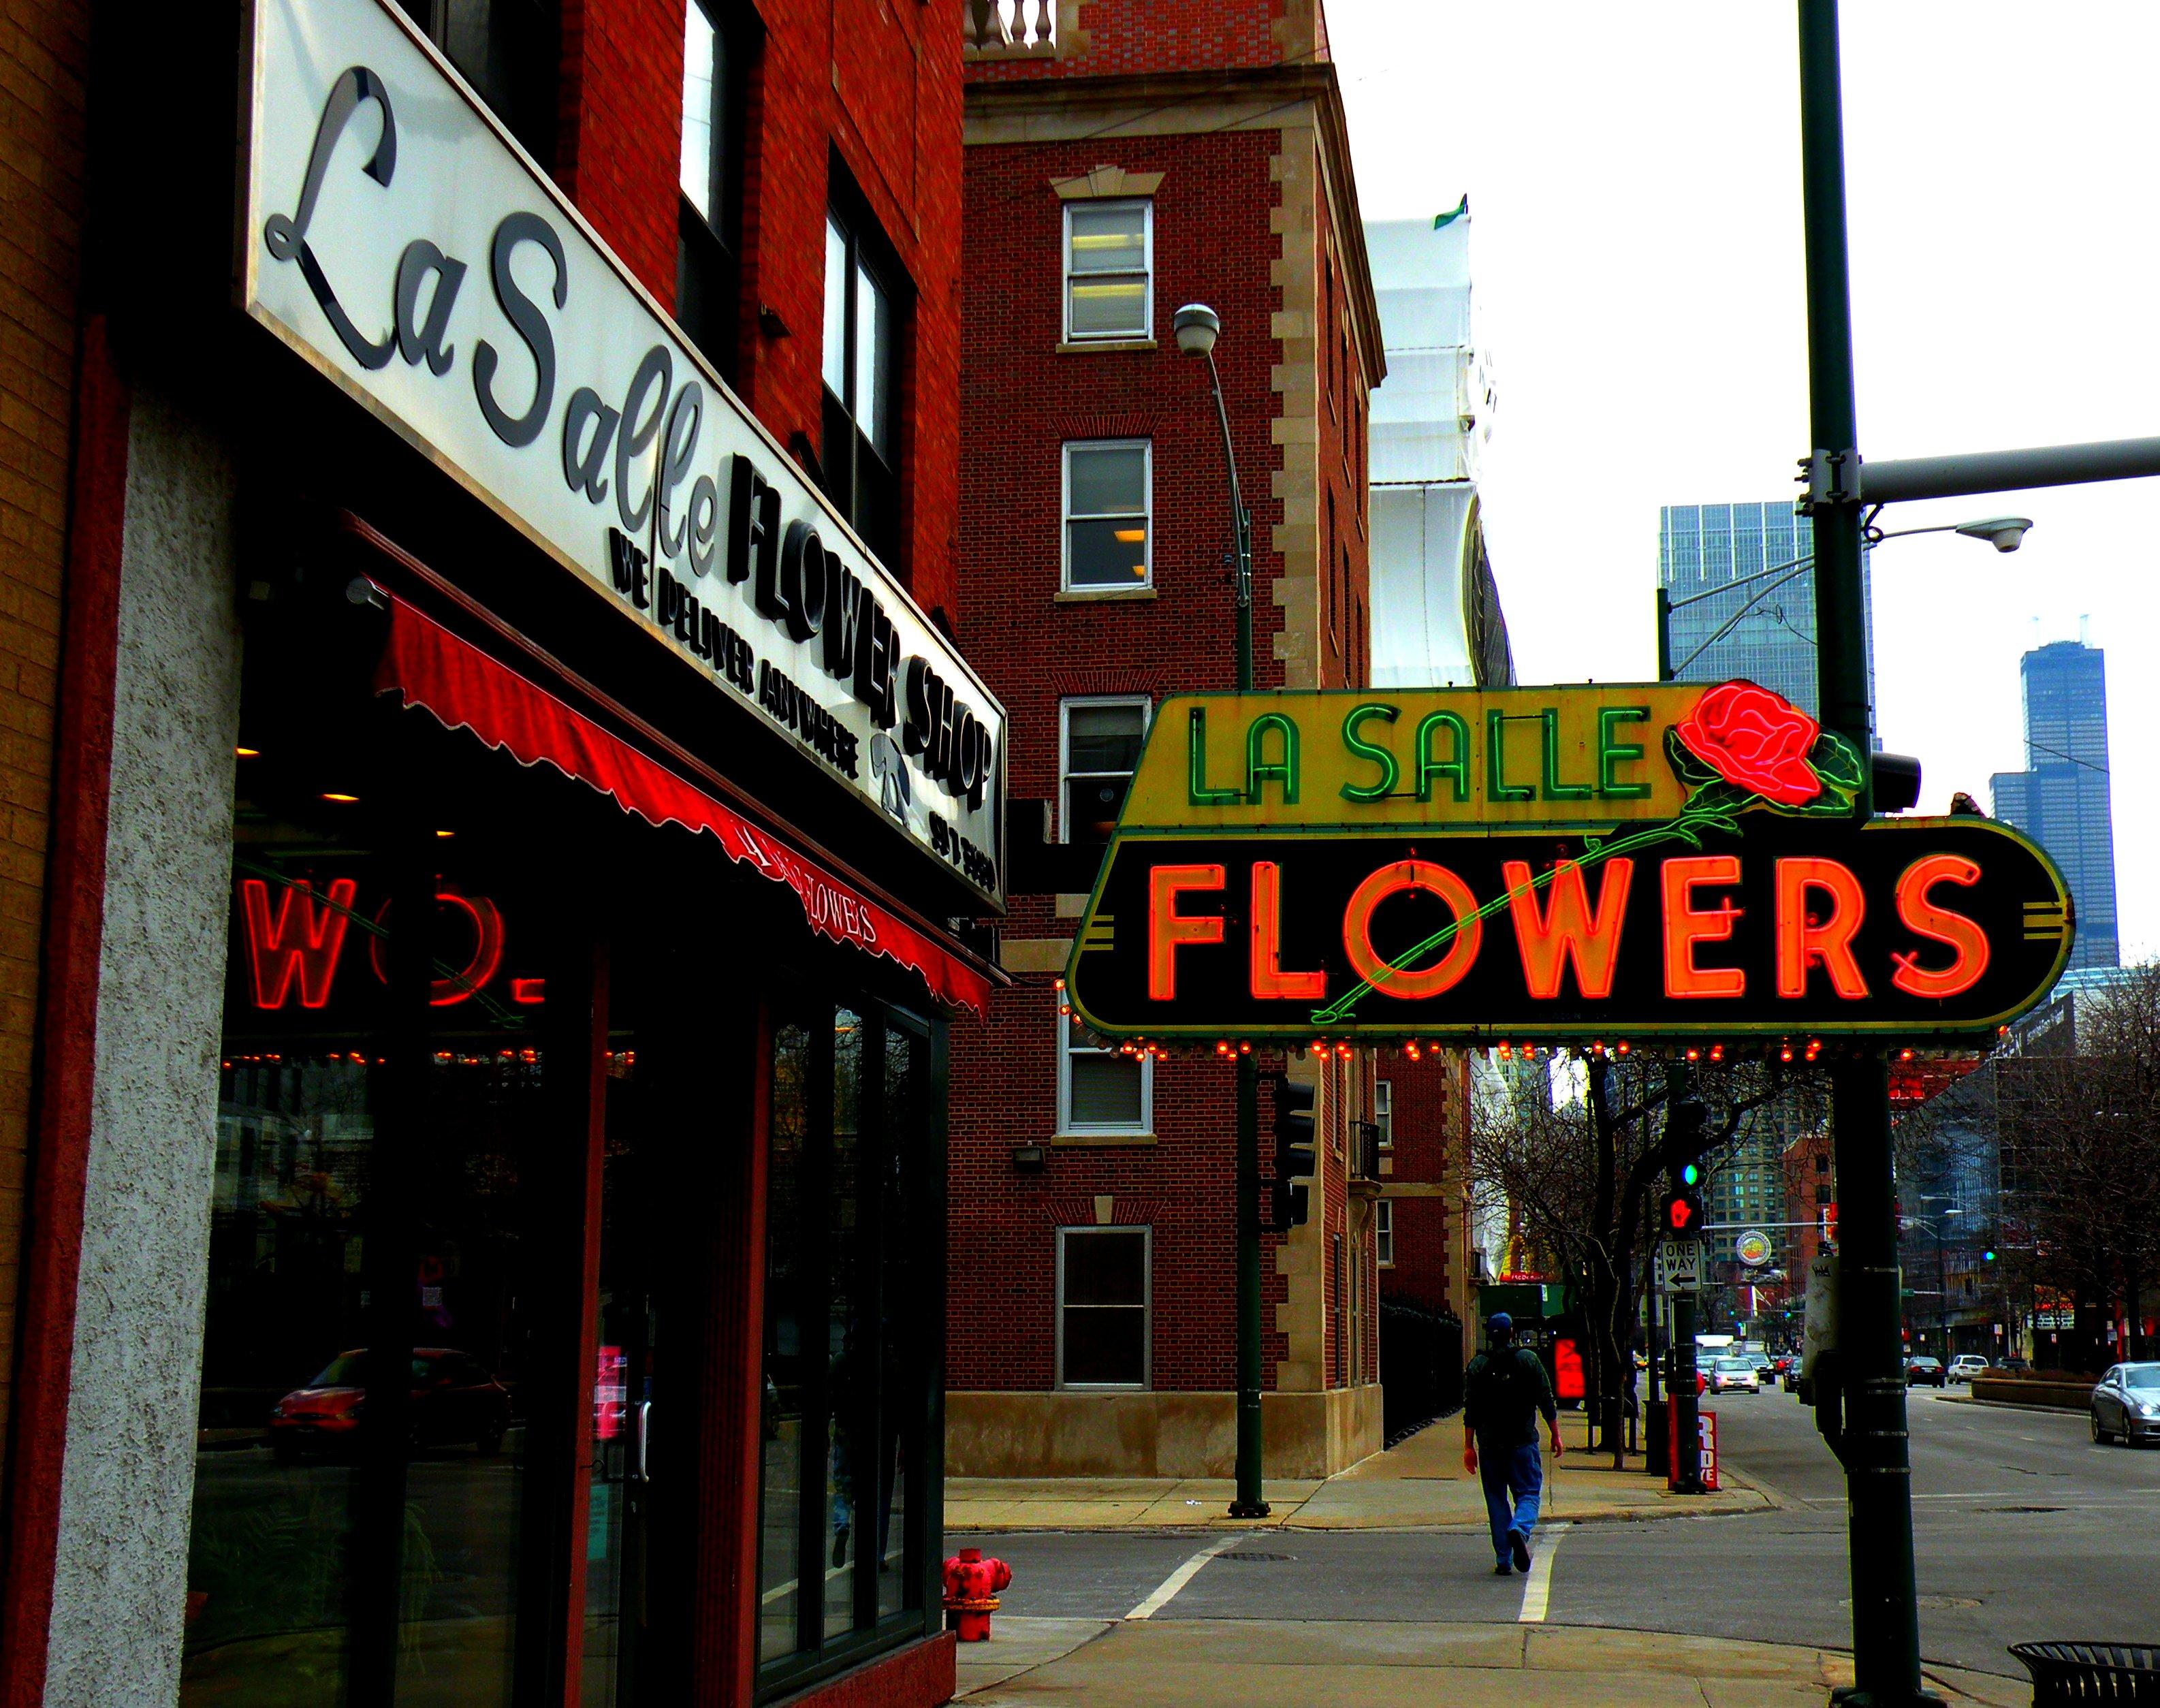 La Salle Flowers - 731 North LaSalle Drive, Chicago, Illinois U.S.A. - March 5, 2009